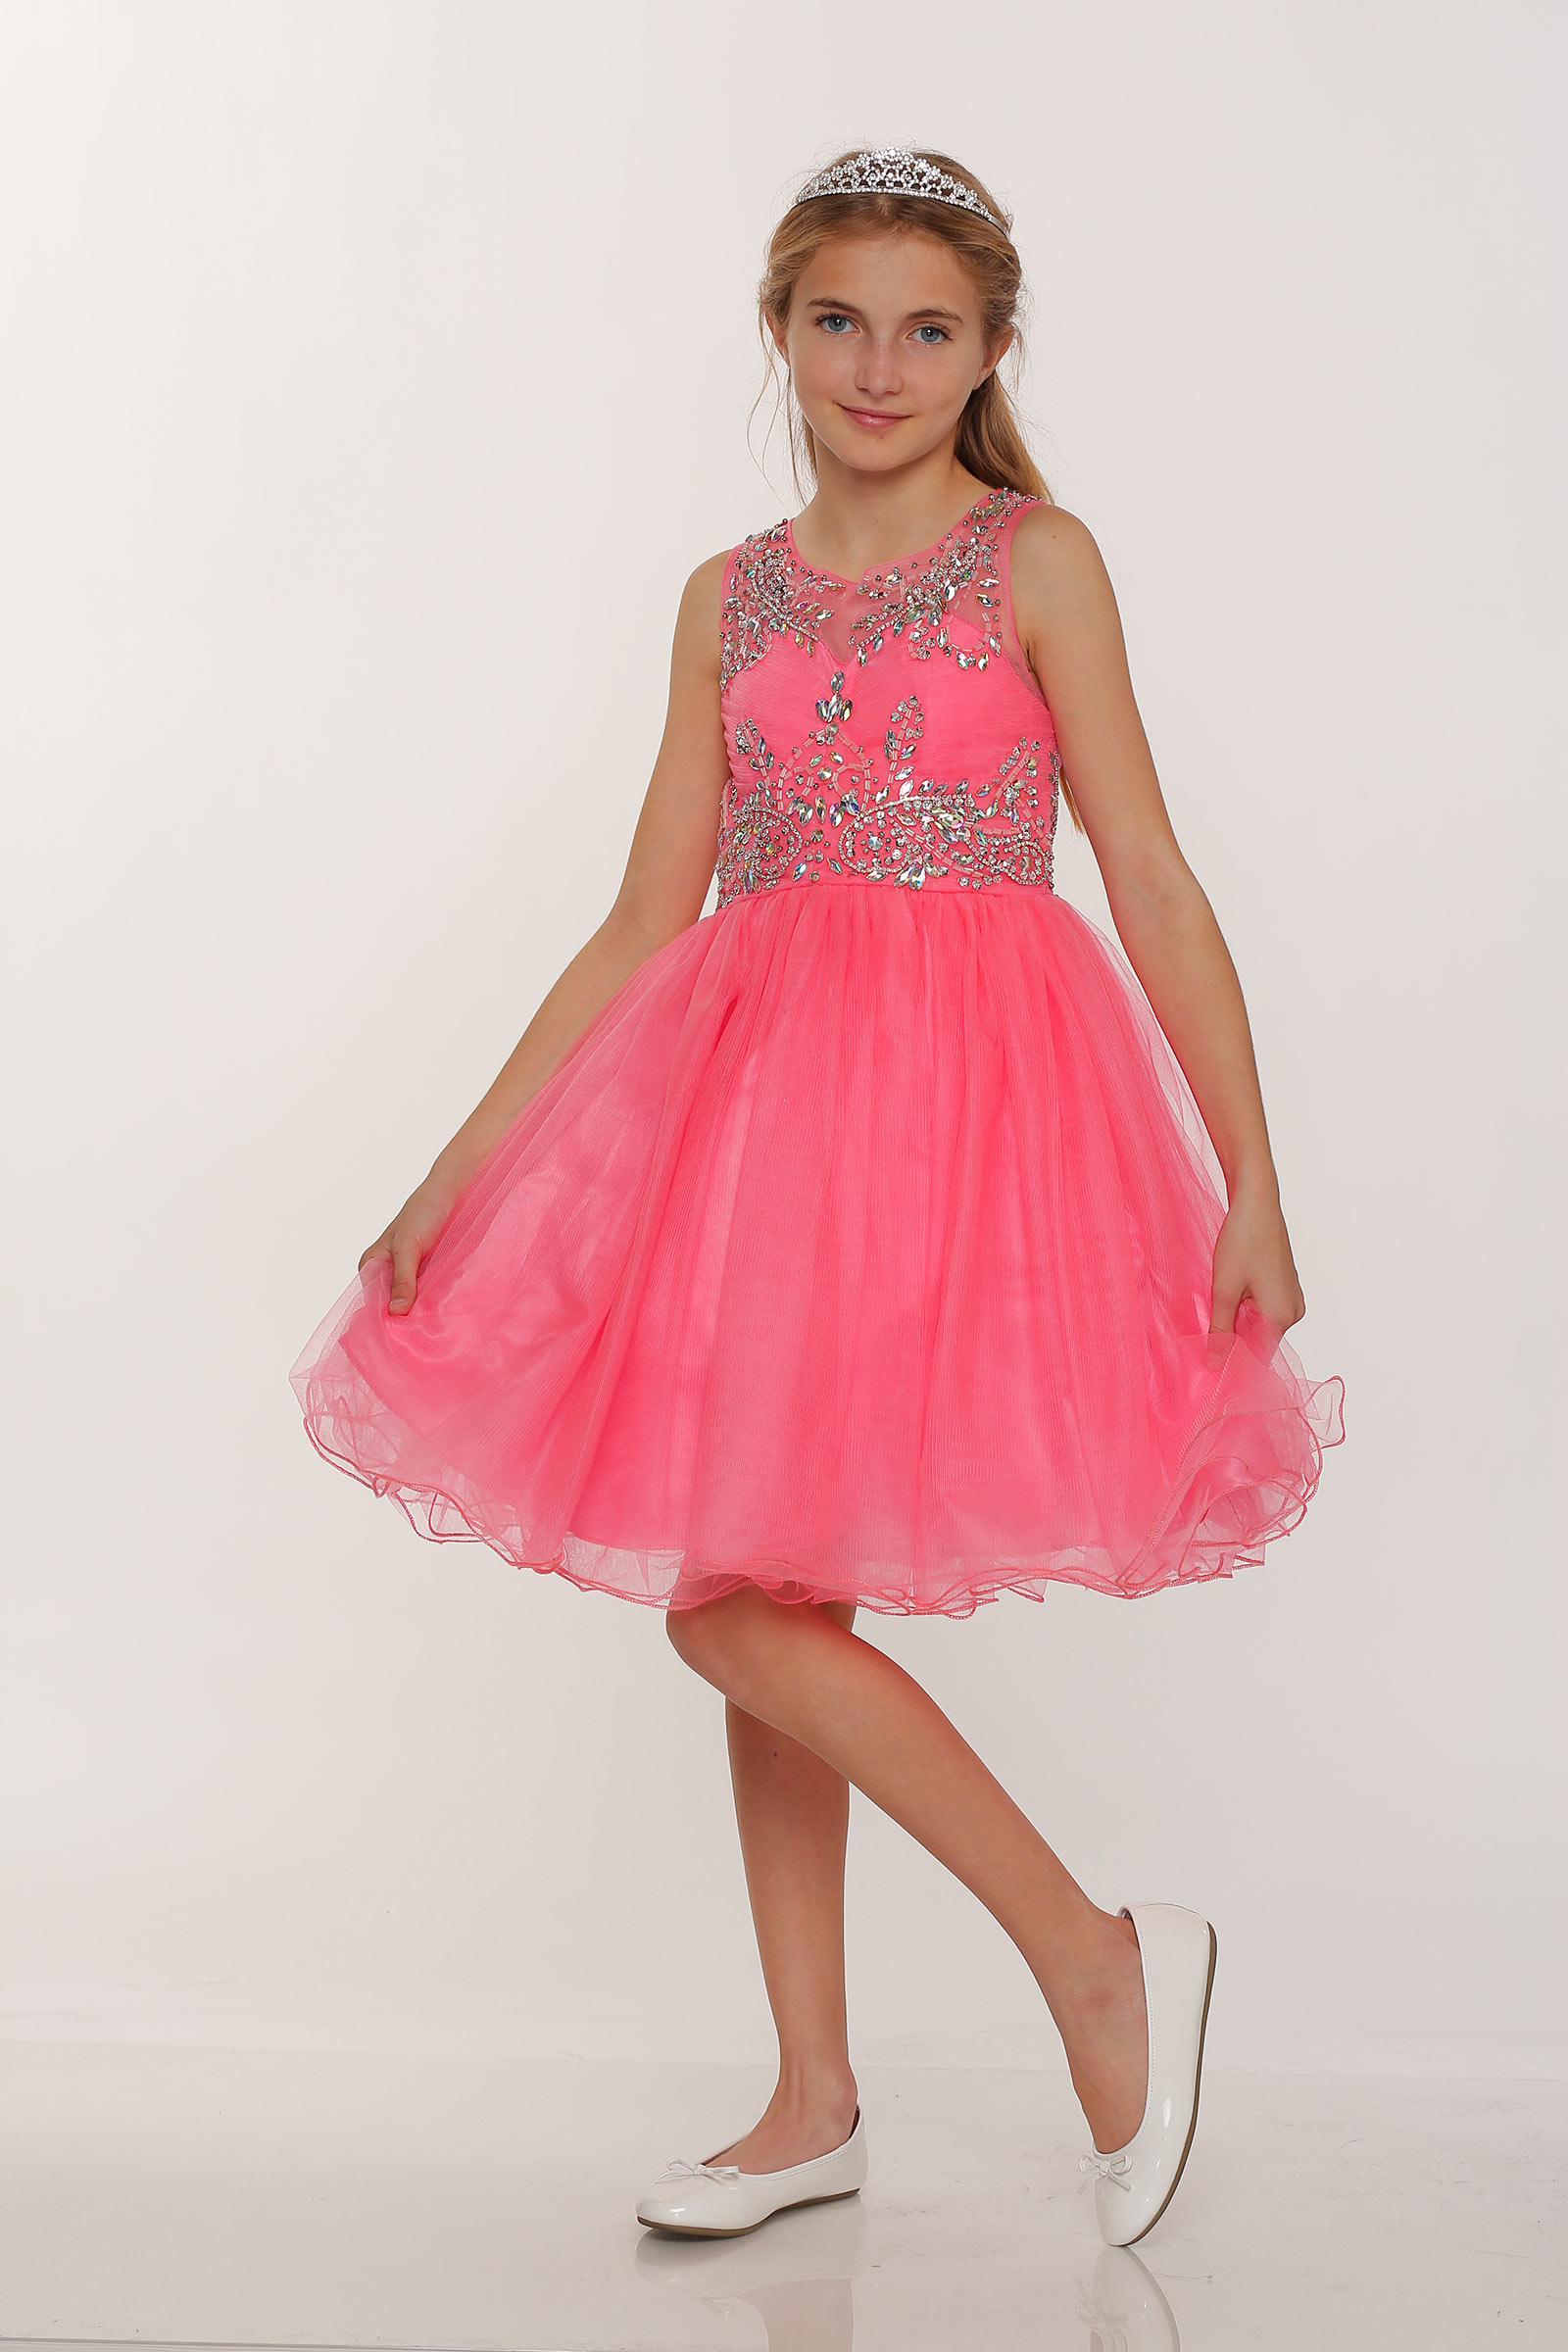 Cc 65007co Girls Dress Style 65007 Coral Sleeveless